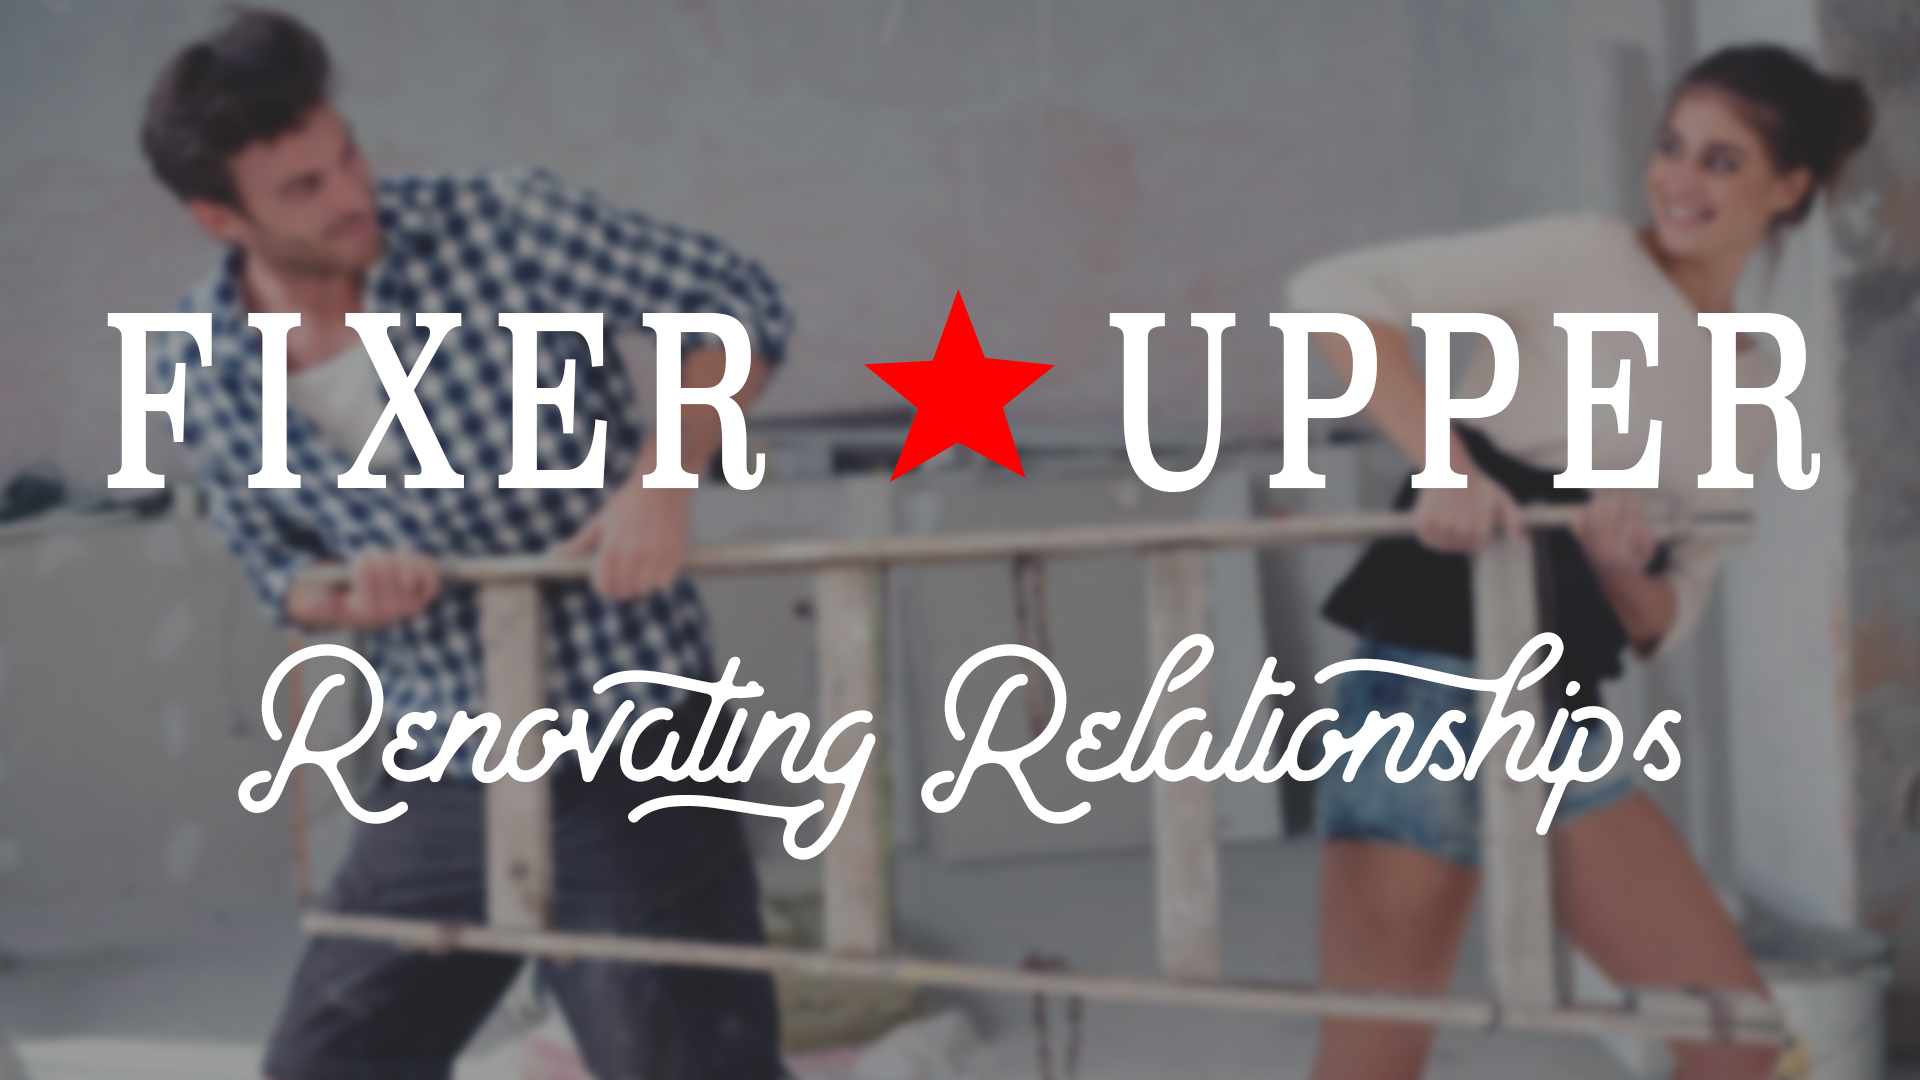 Fixer Upper: Renovating Friendships